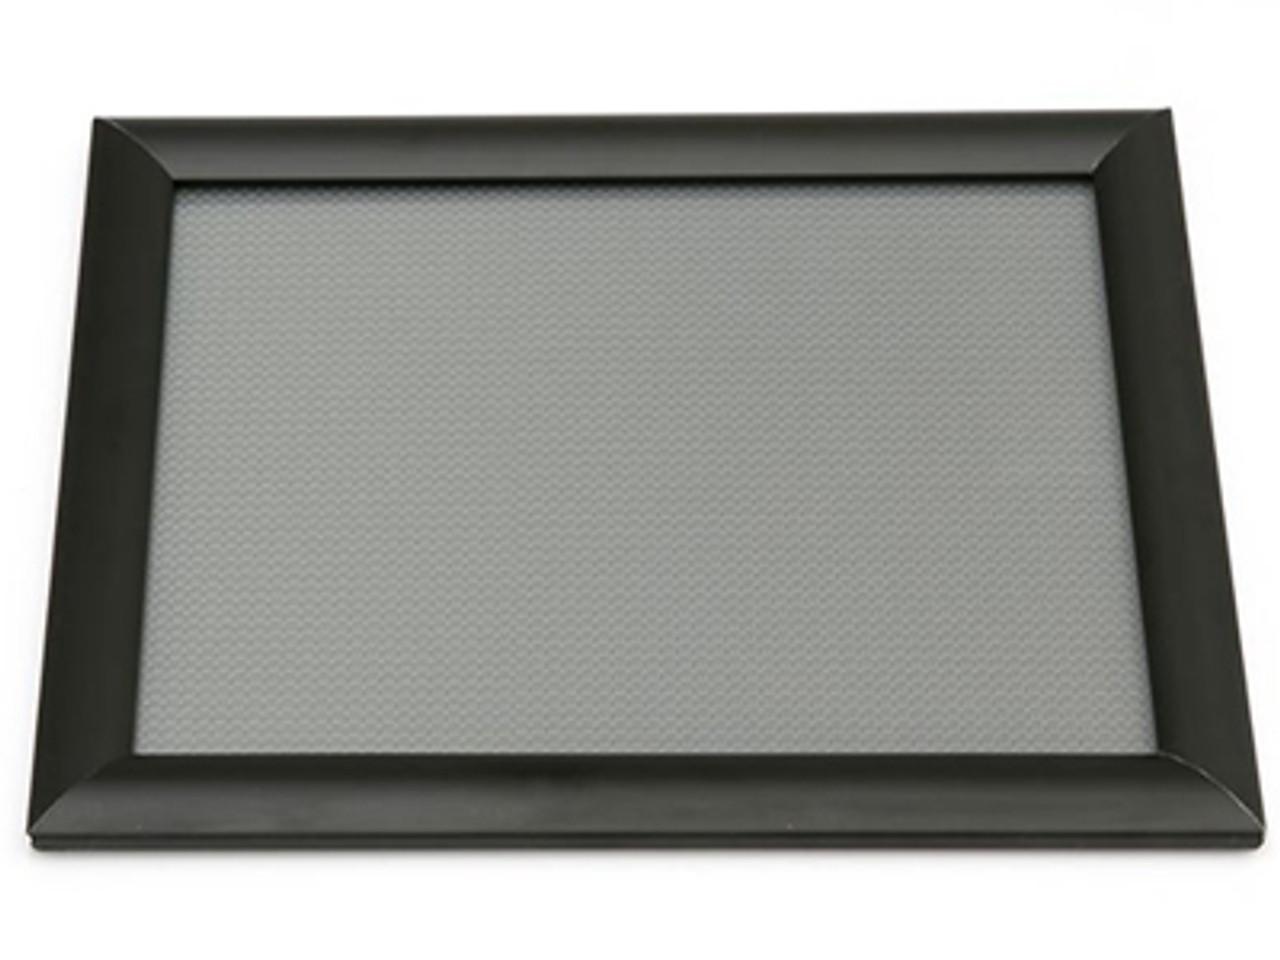 "Aluminum Snap Frame - Black - 11""w x 8.5""h - 1/Pack"